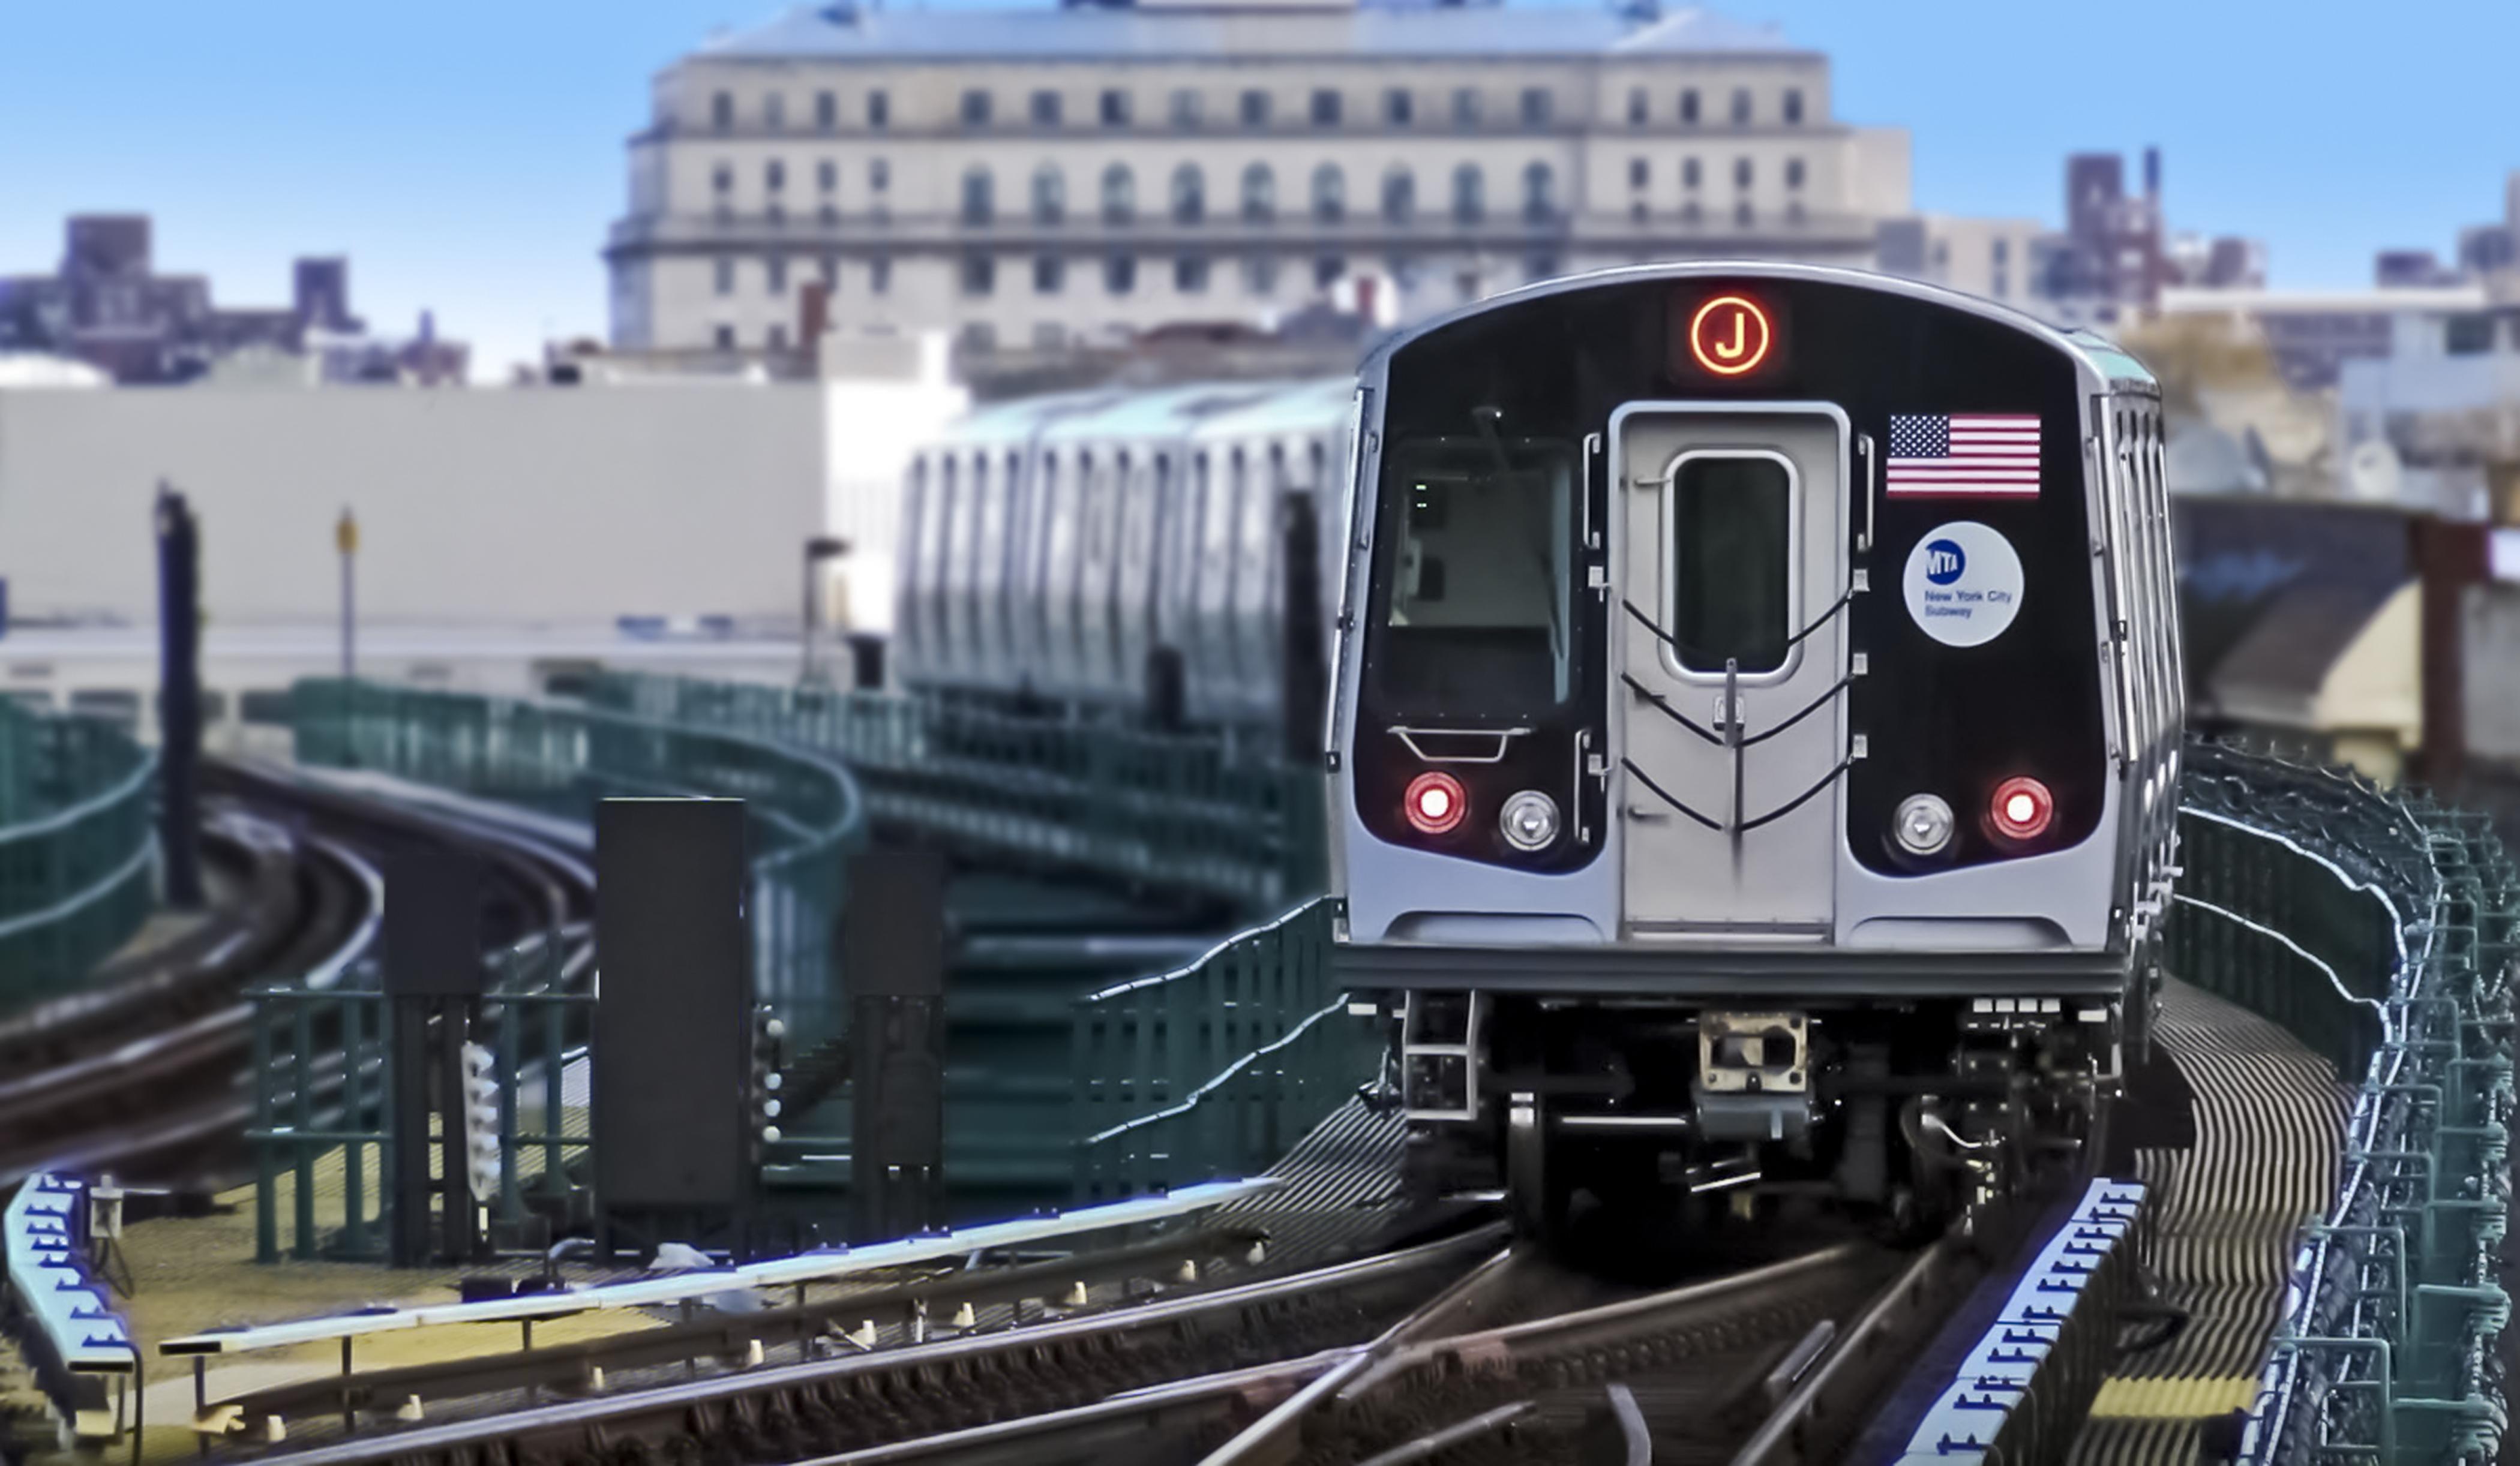 Bombardier R179 New York subway train